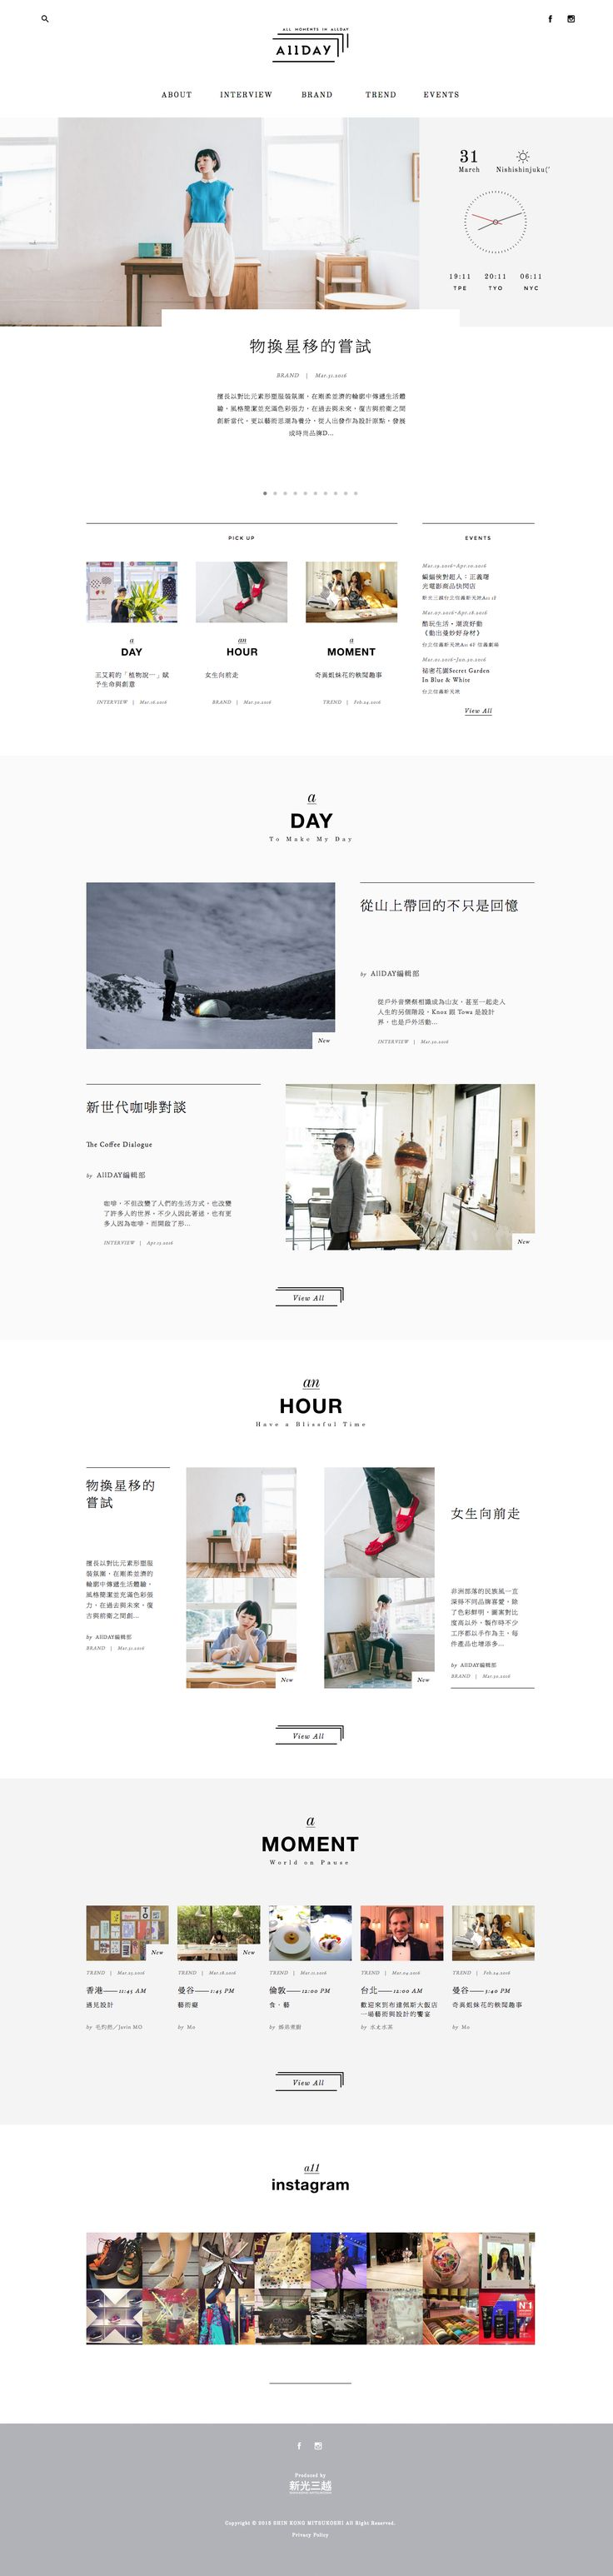 Allday | works - PRESENT #design #layout #webdesign #branding #uidesign #website #minimal #ウェブデザイン #ウェブサイトデザイン #ブランディング